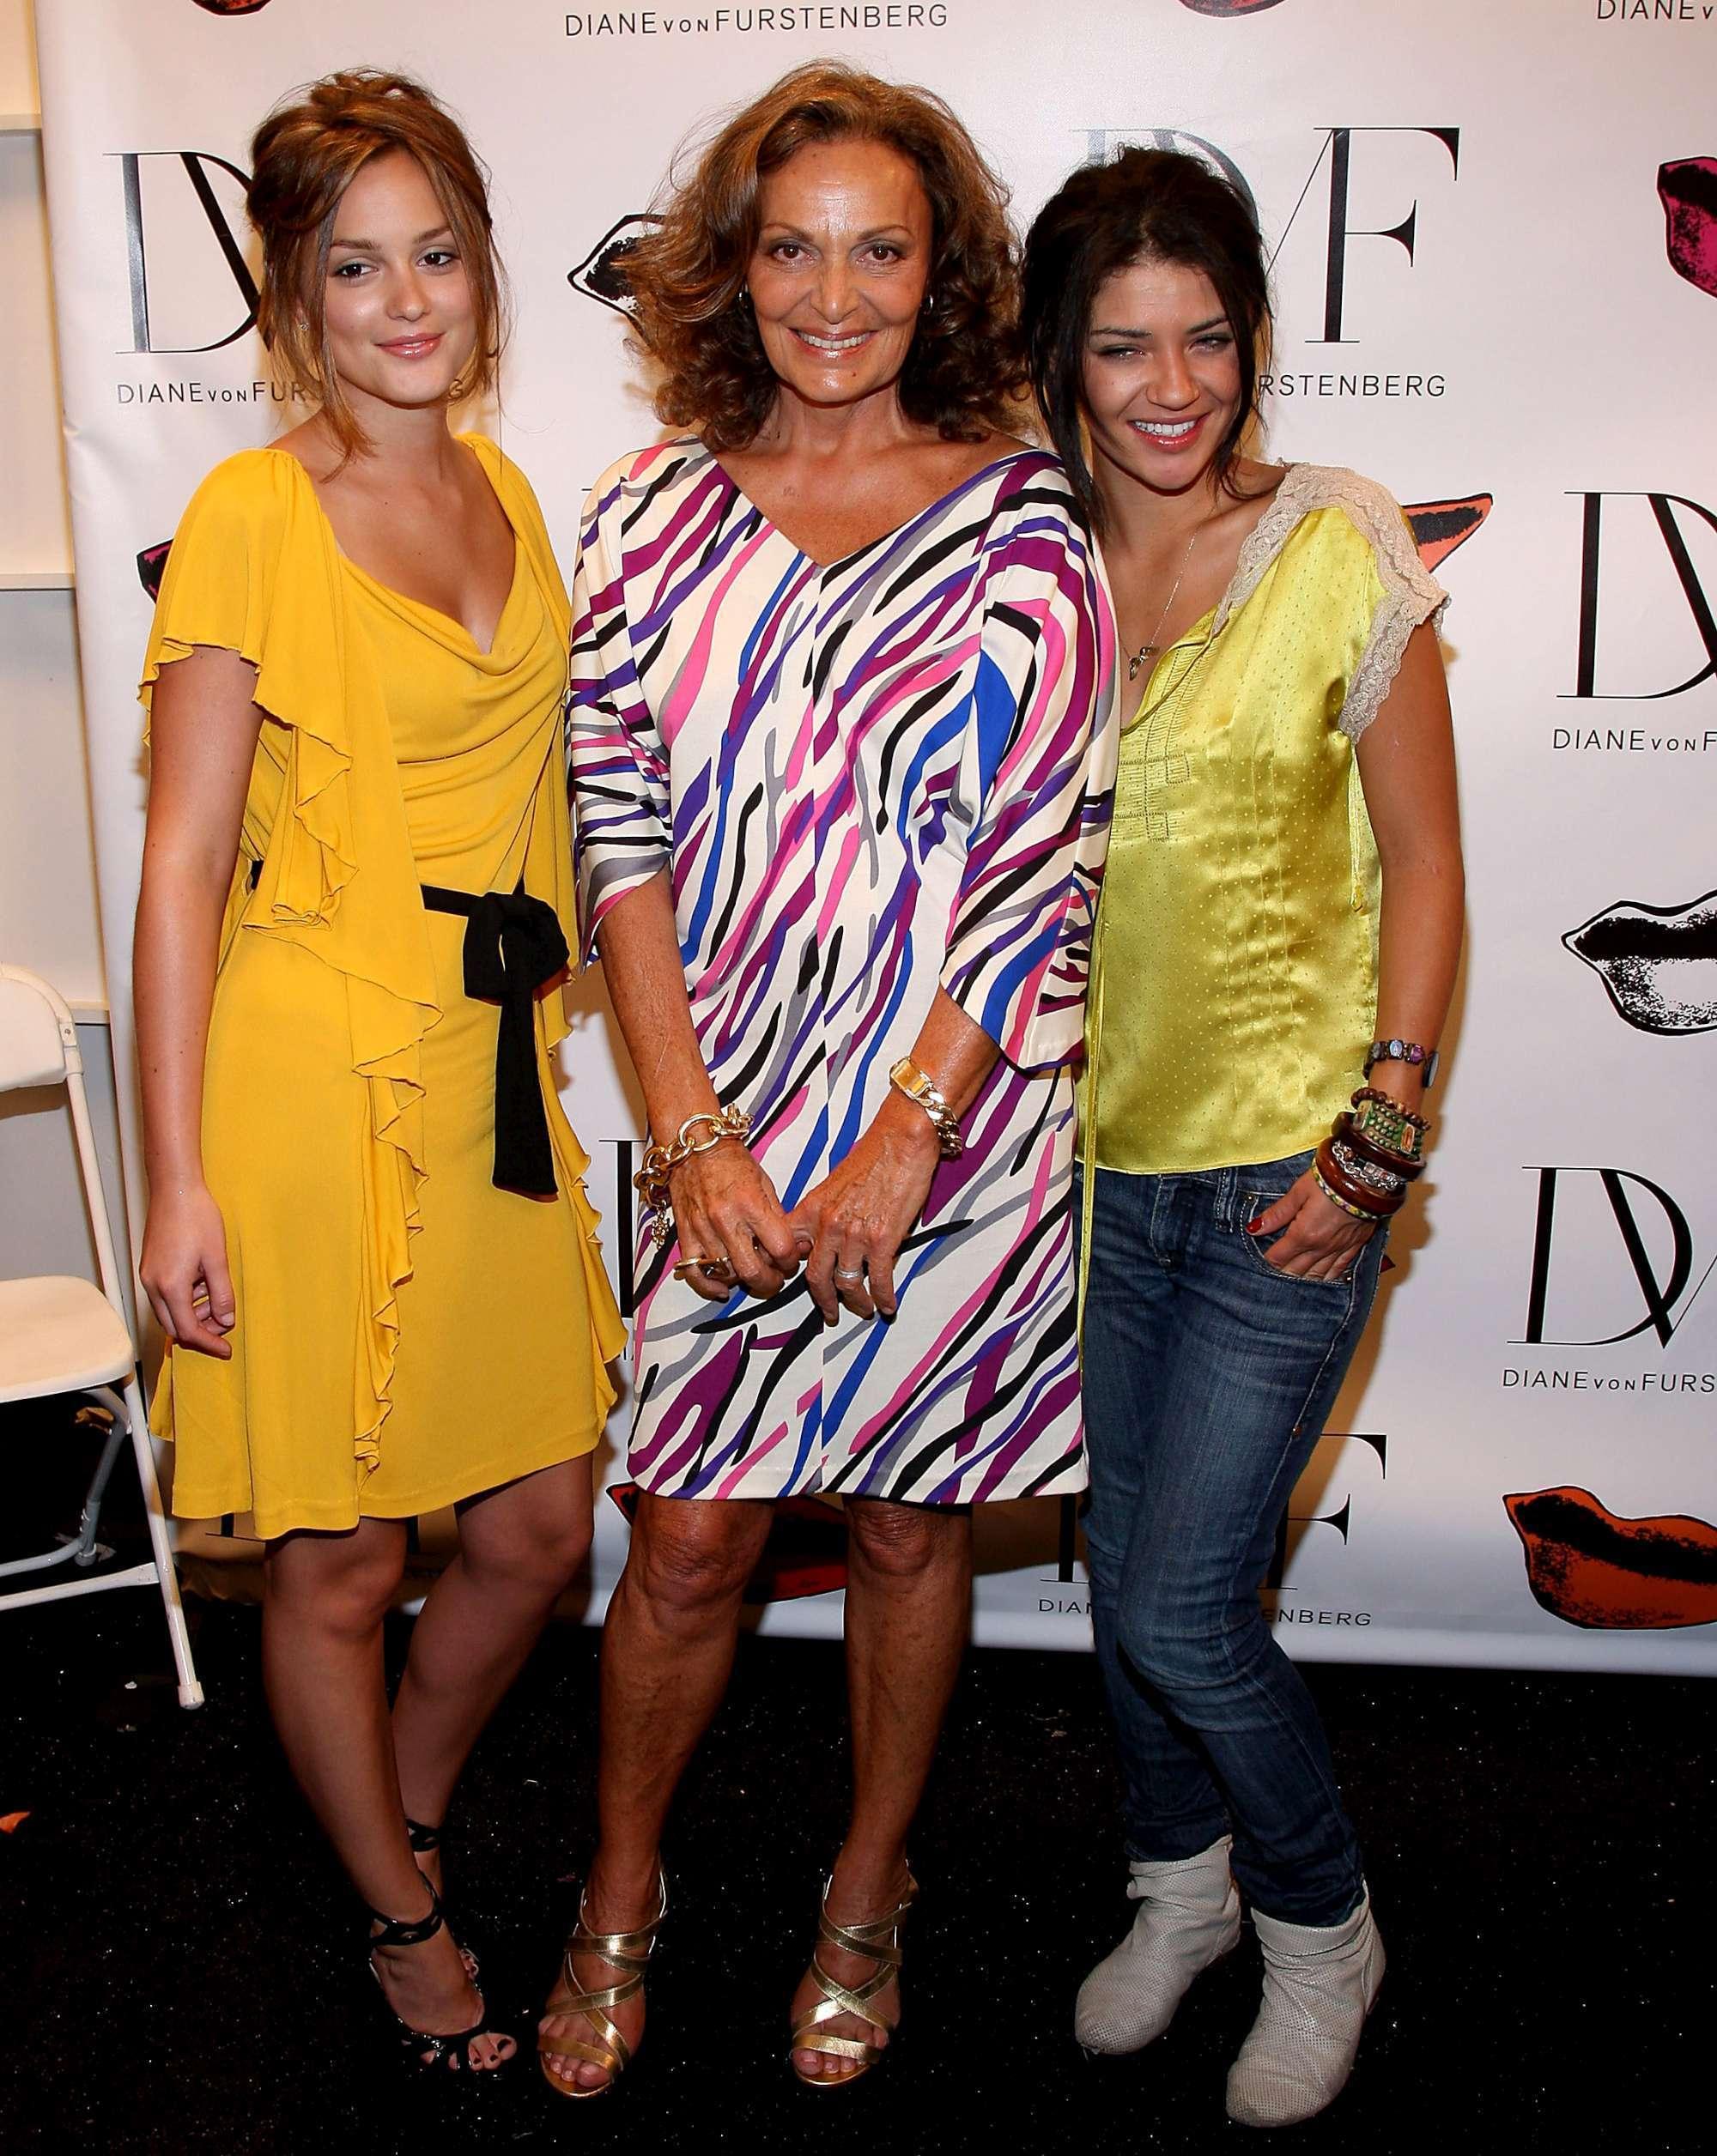 Gossip Girl images GG actors Diane Von Furstenberg Front Row HD 2000x2512